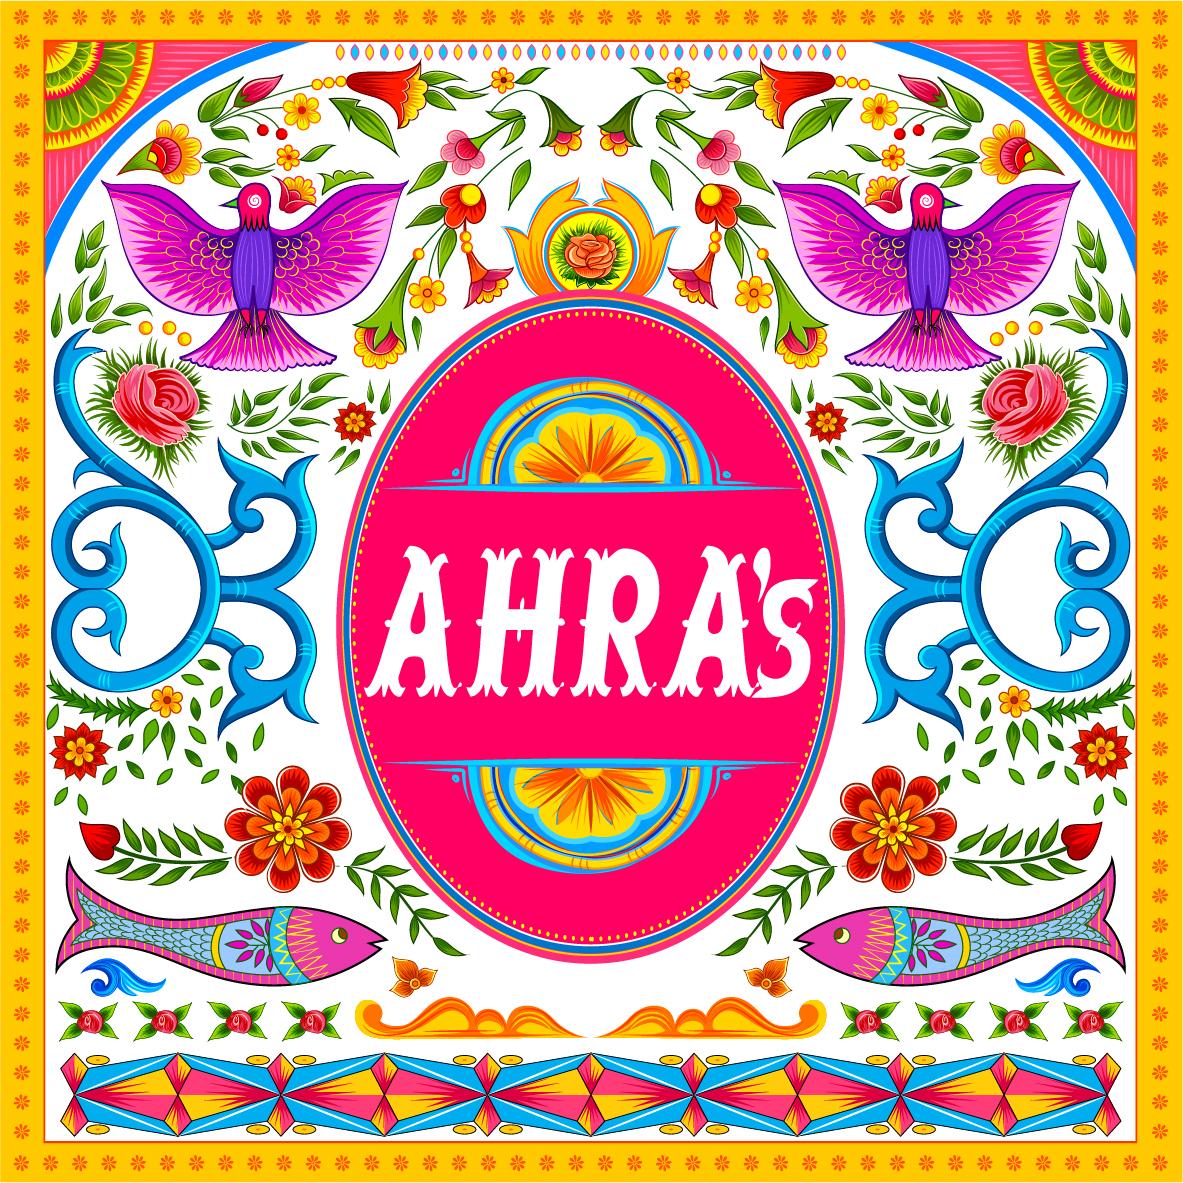 AHRA's Traditional Art